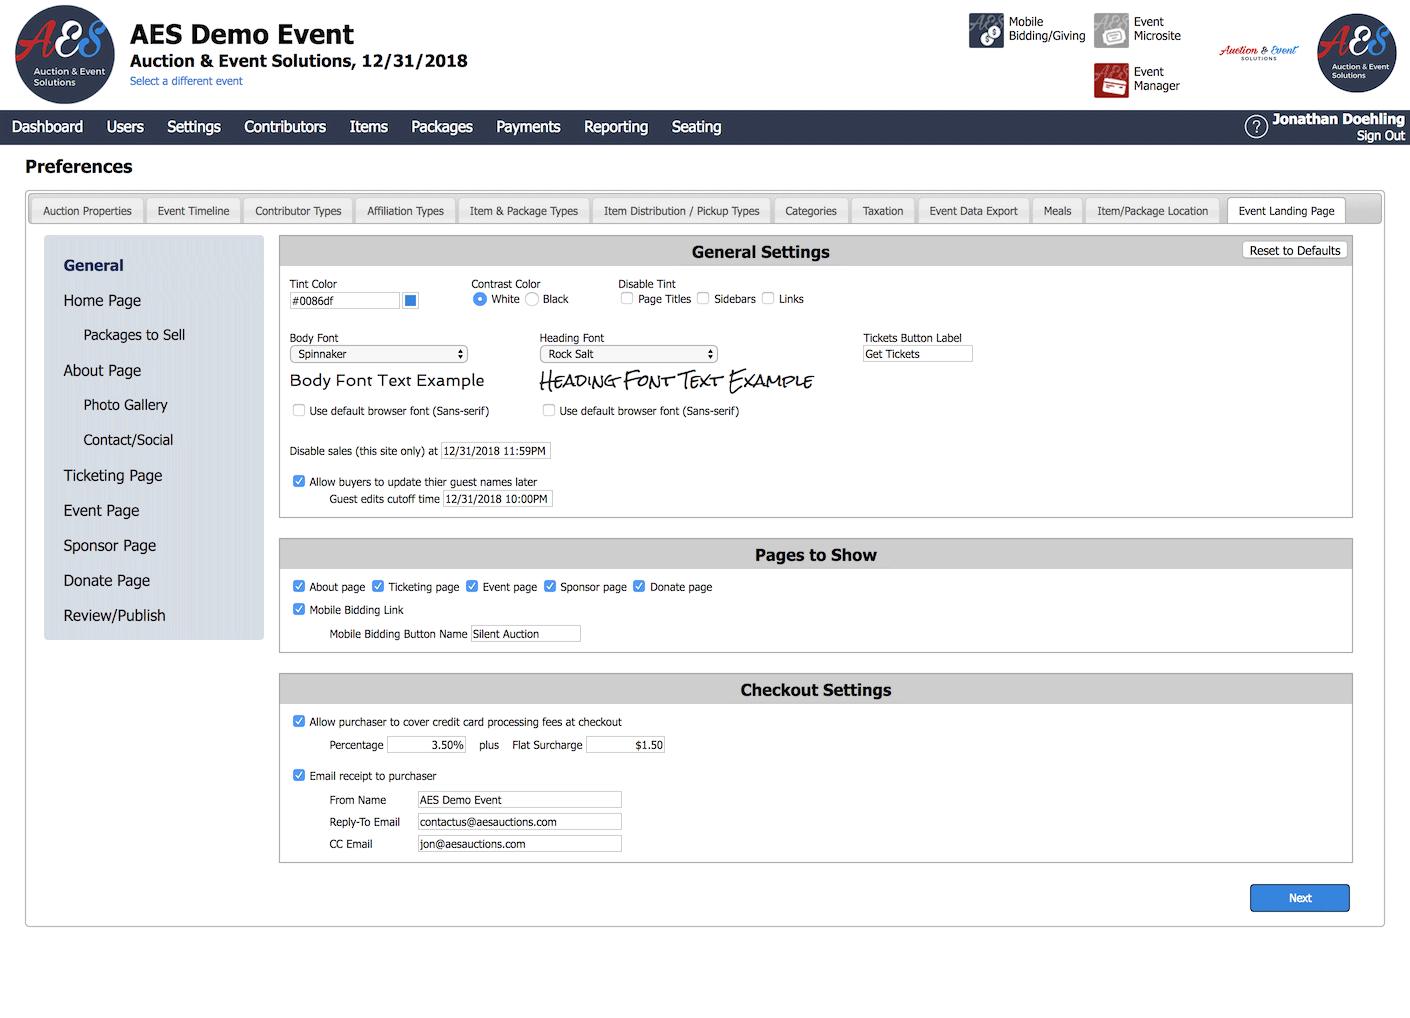 www.auctionconductor.com_PreferencesDesktop